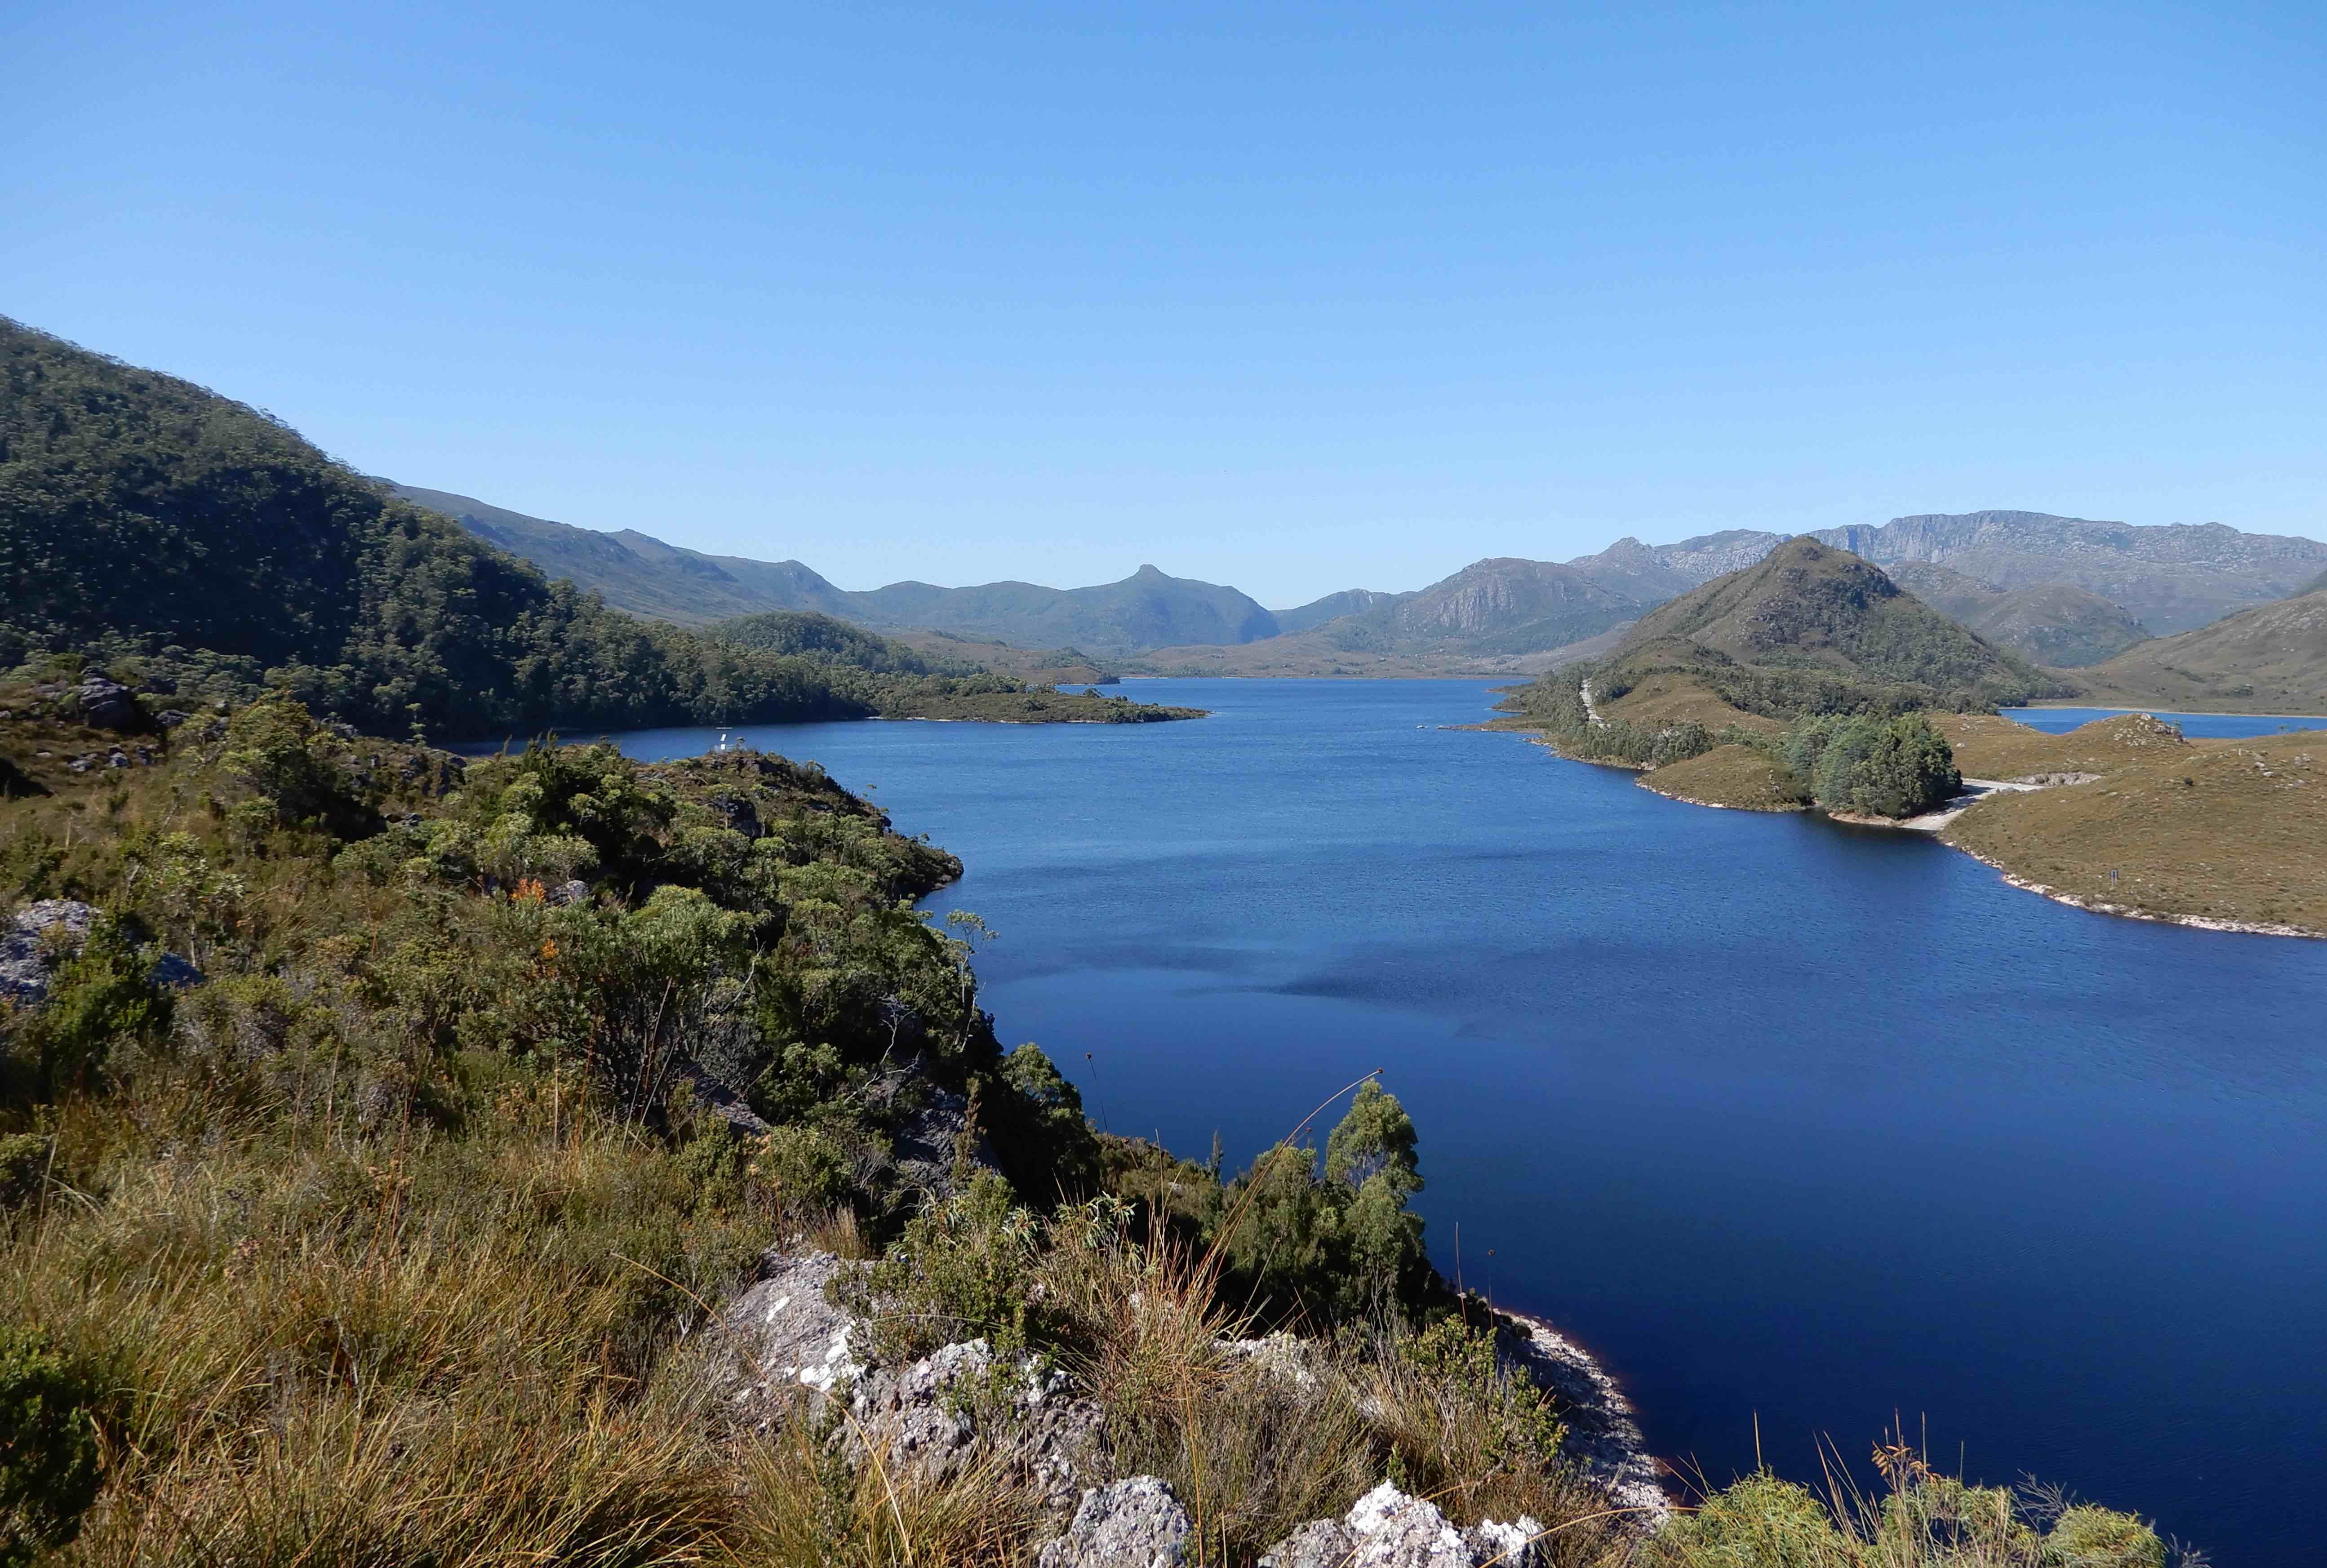 1.Lake Plimsoll